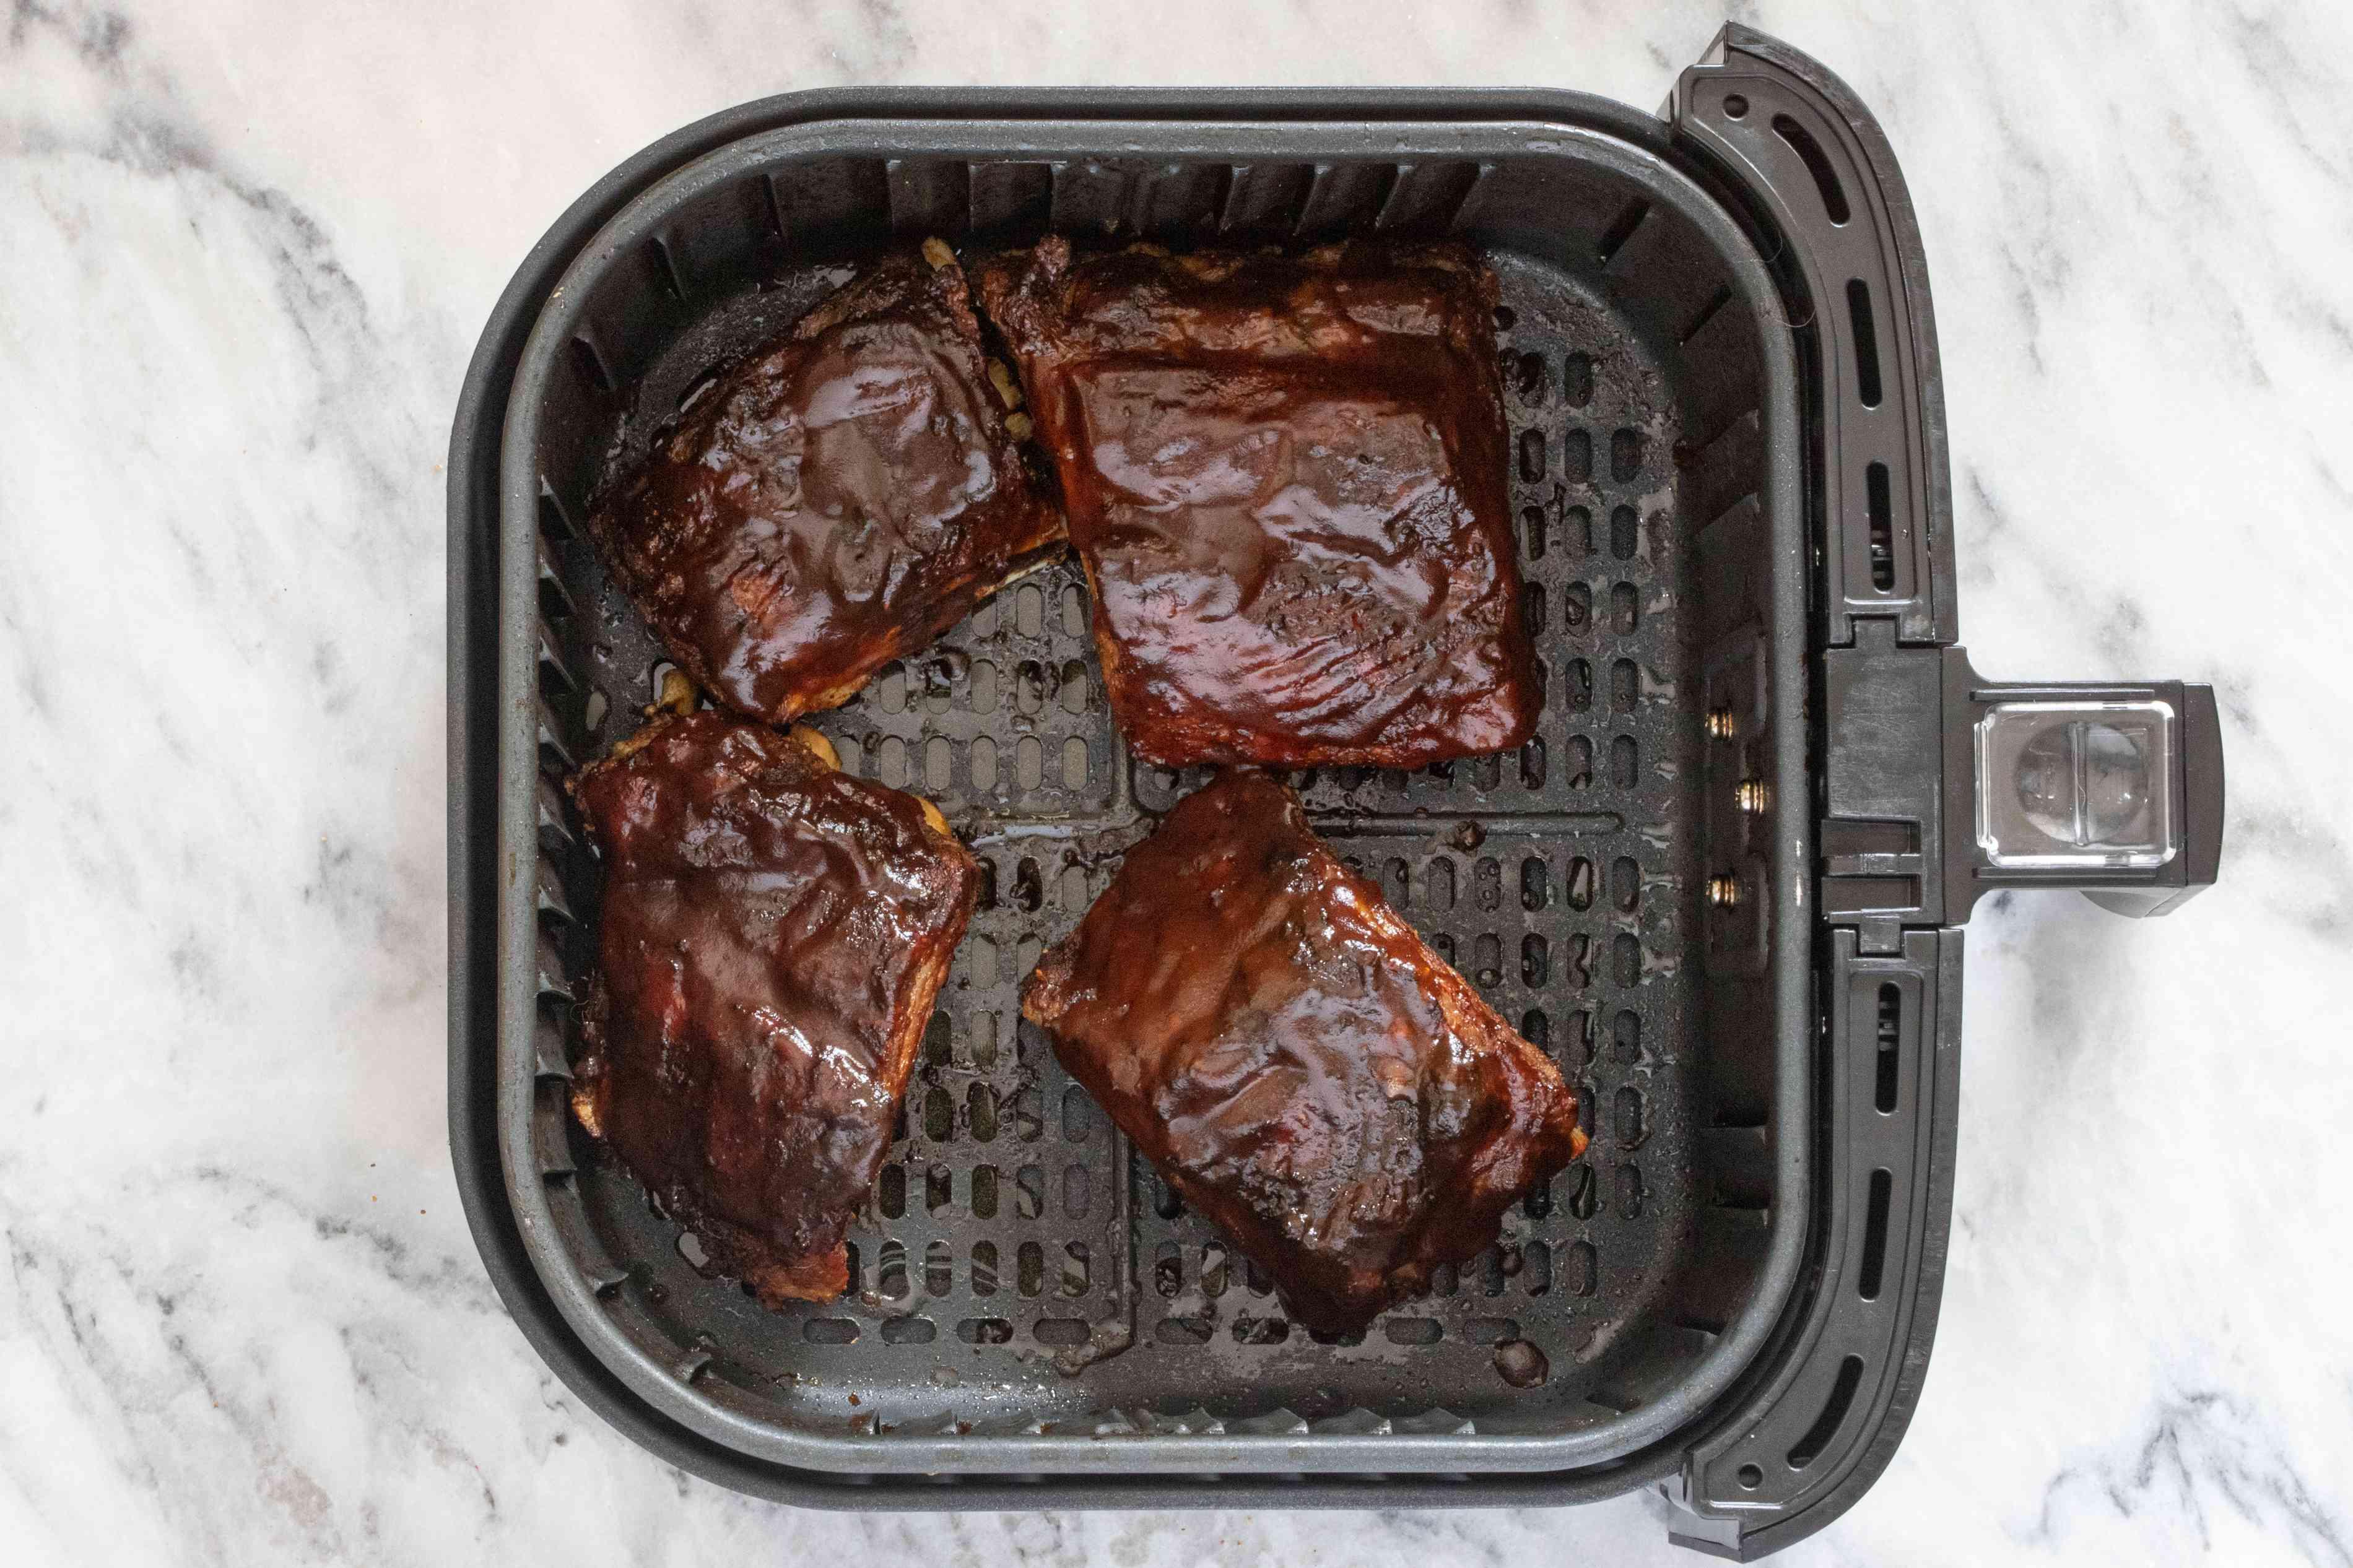 Pork ribs in the air fryer basket